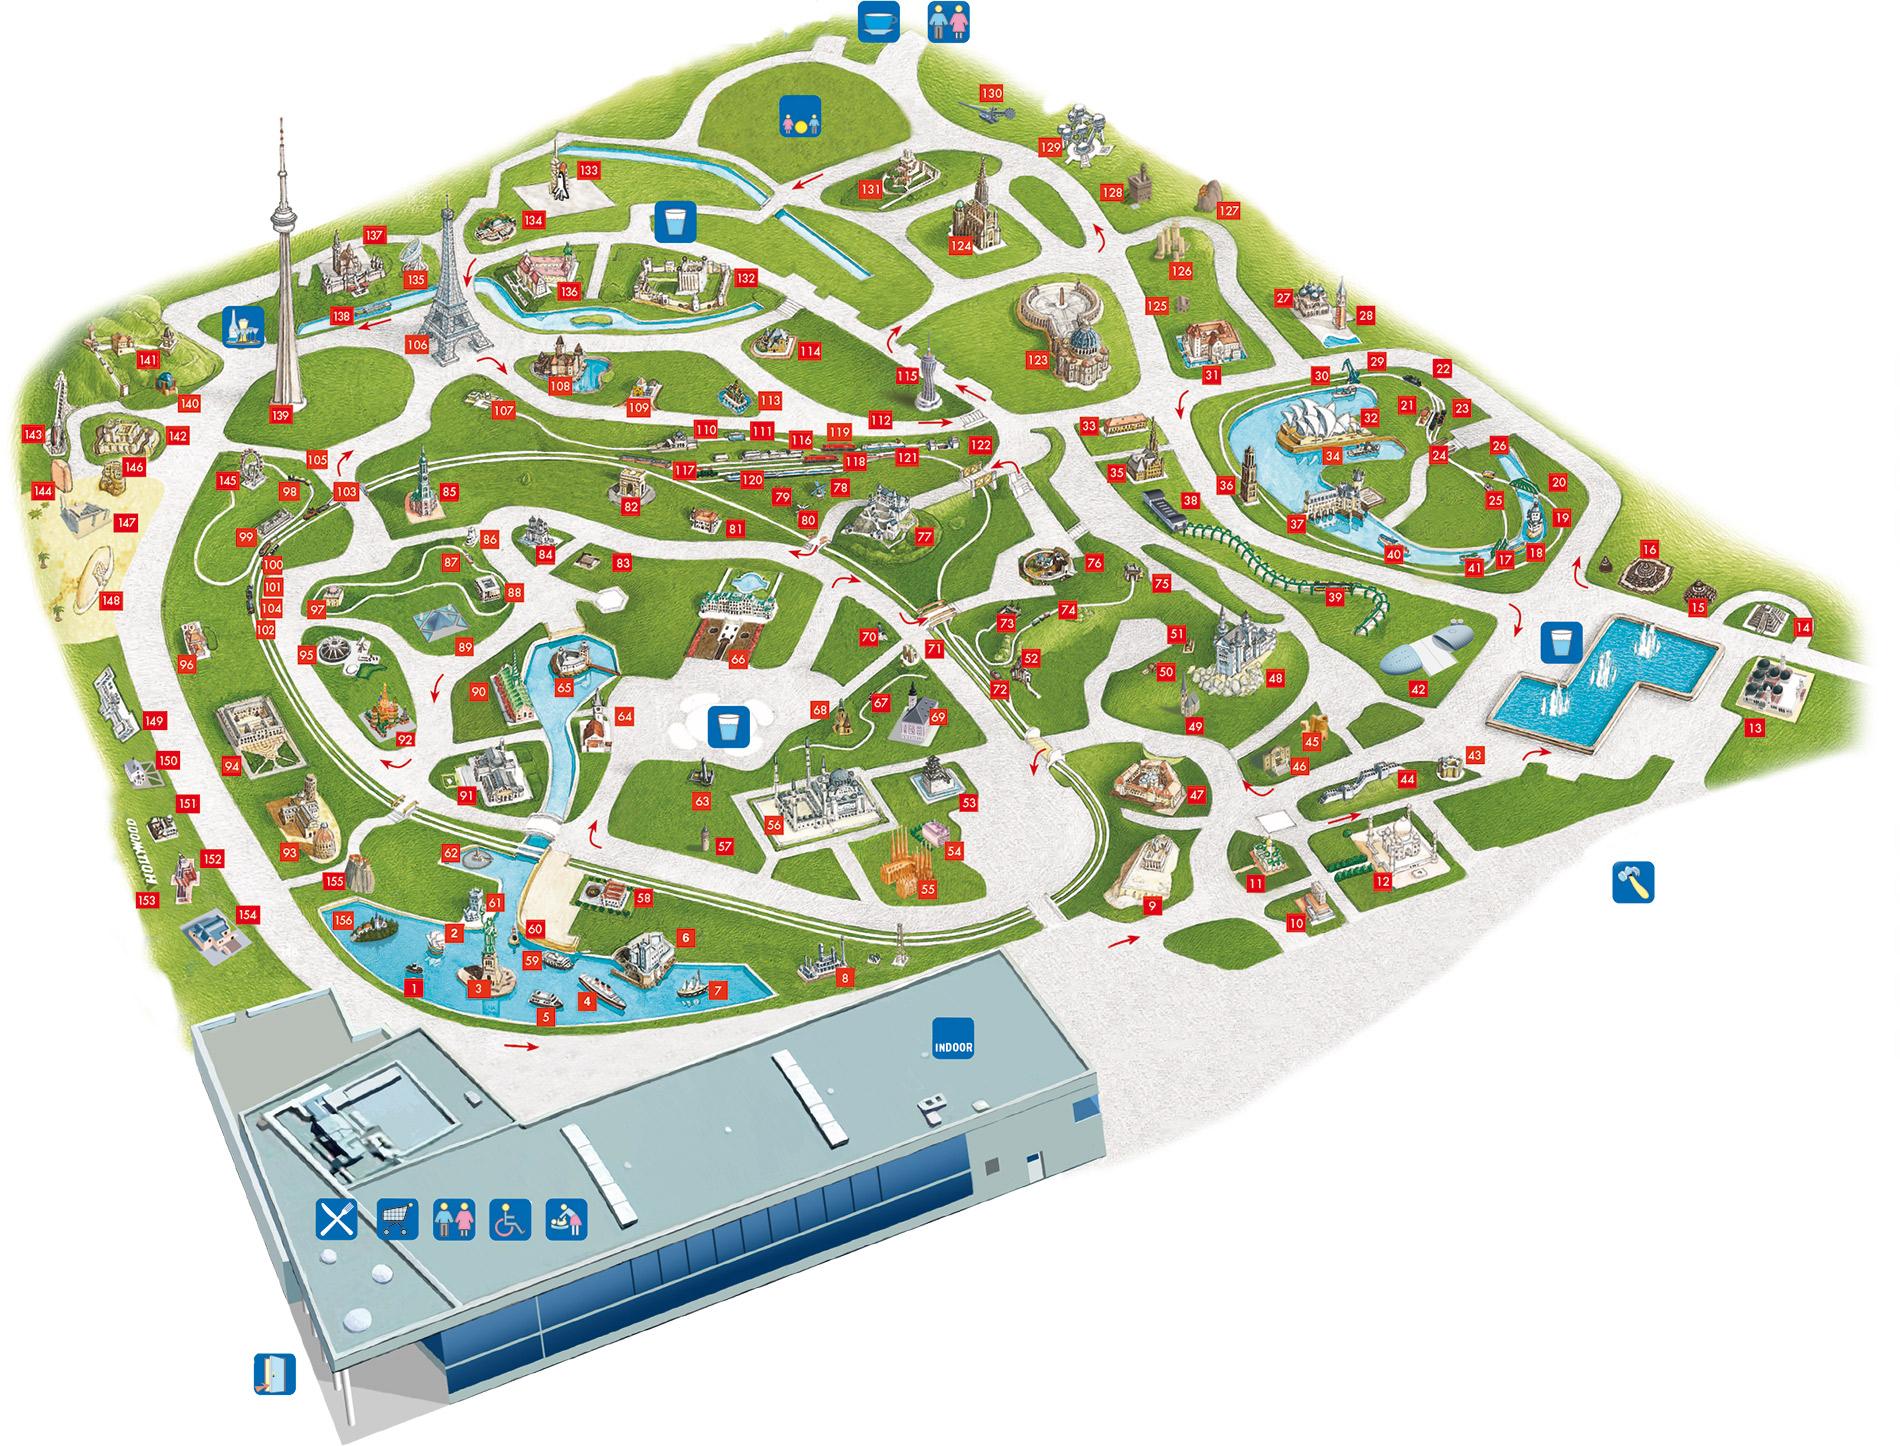 Park Map Attractions Carinthia Klagenfurt Excursions Minimundus - Klagenfurt austria map